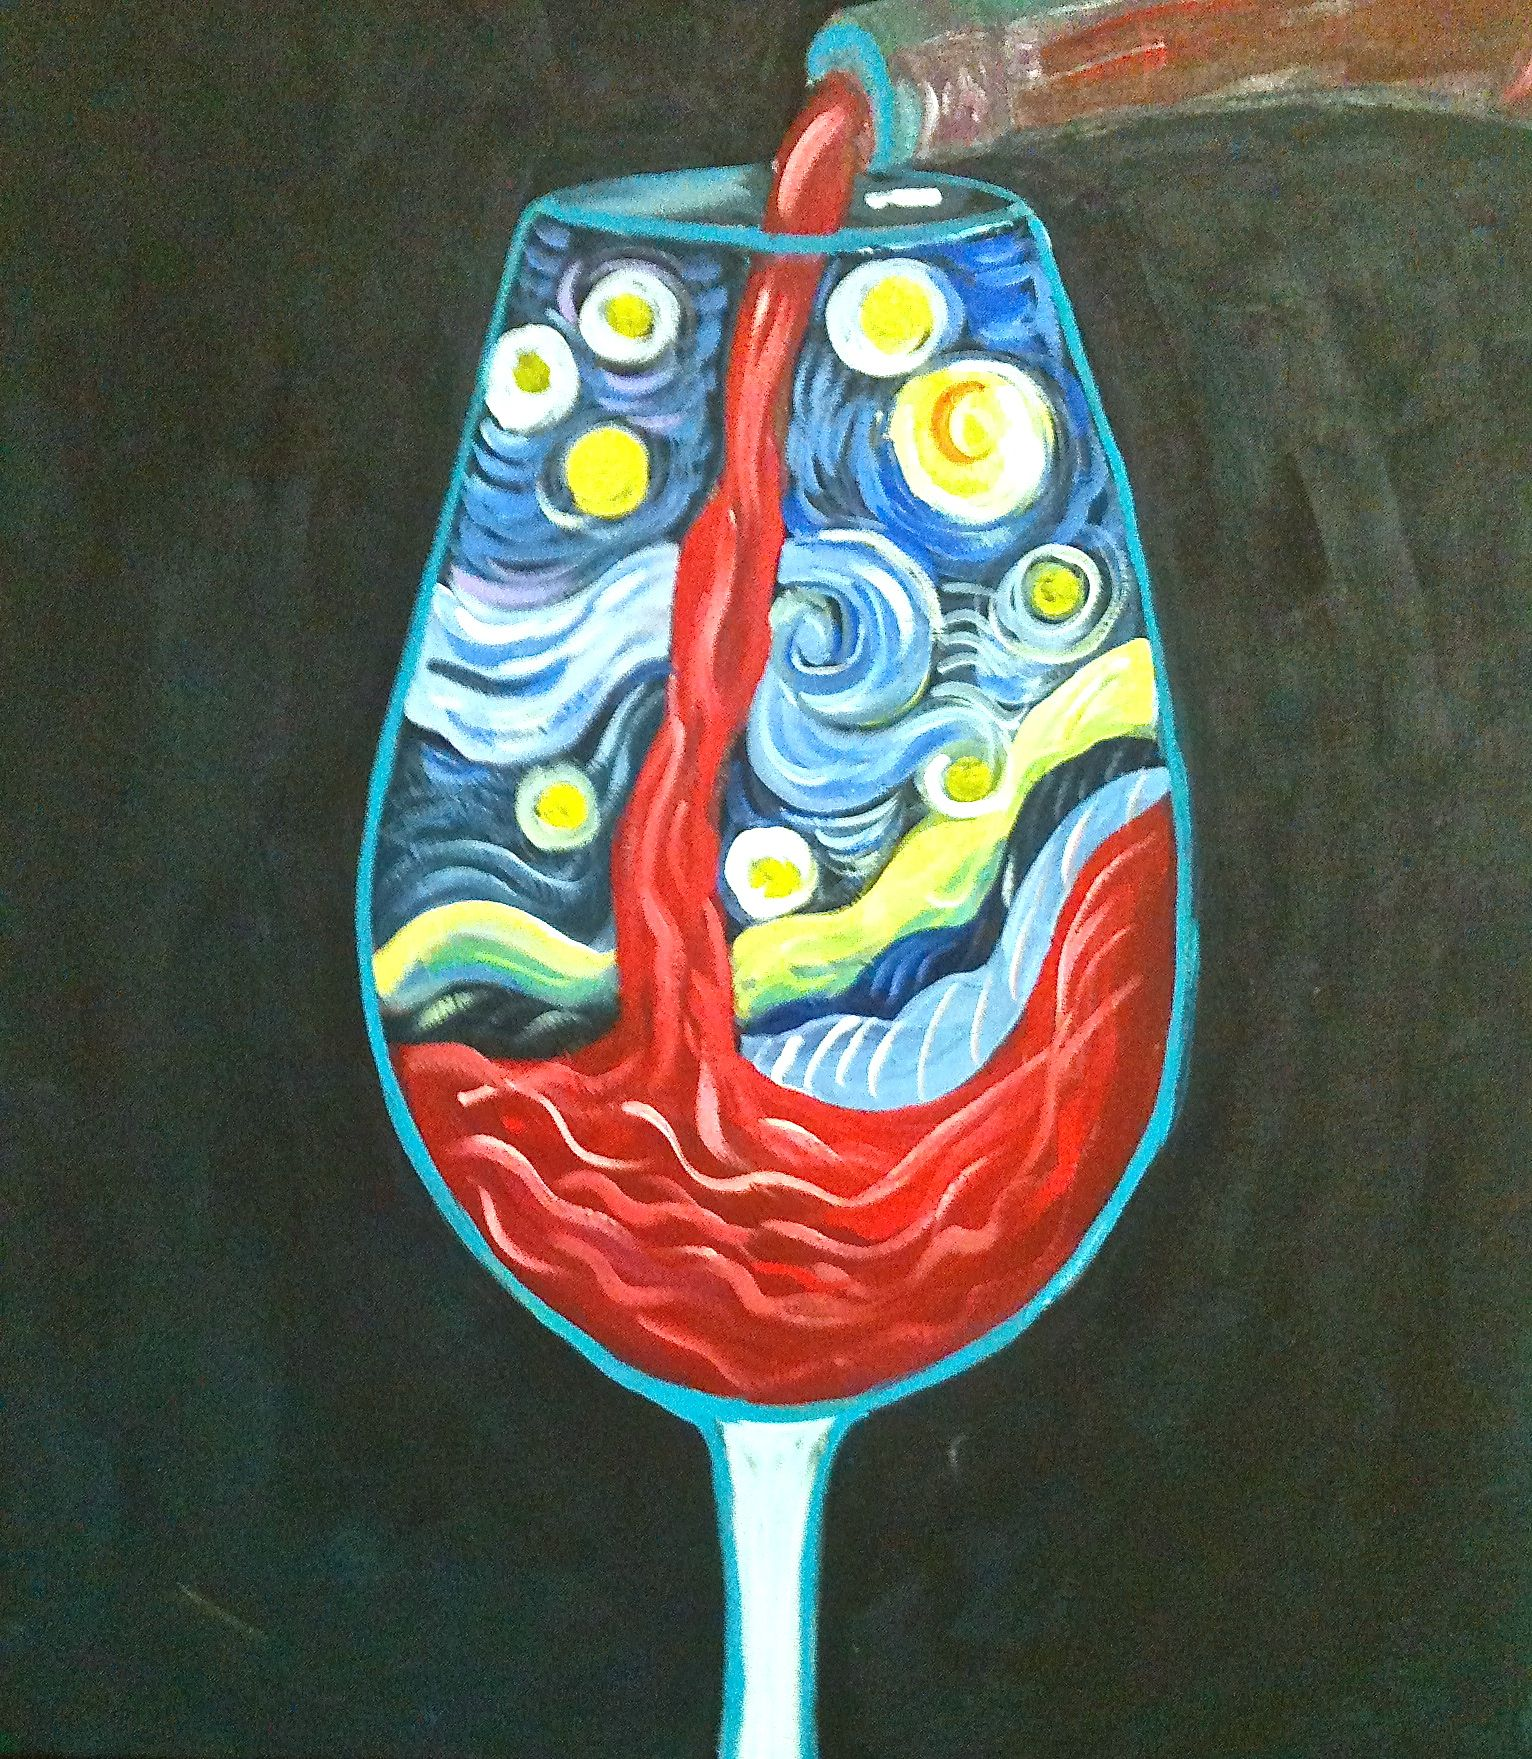 Van Gogh Wine Glass Painting Art Painting Canvas Art Painting Painting Art Projects